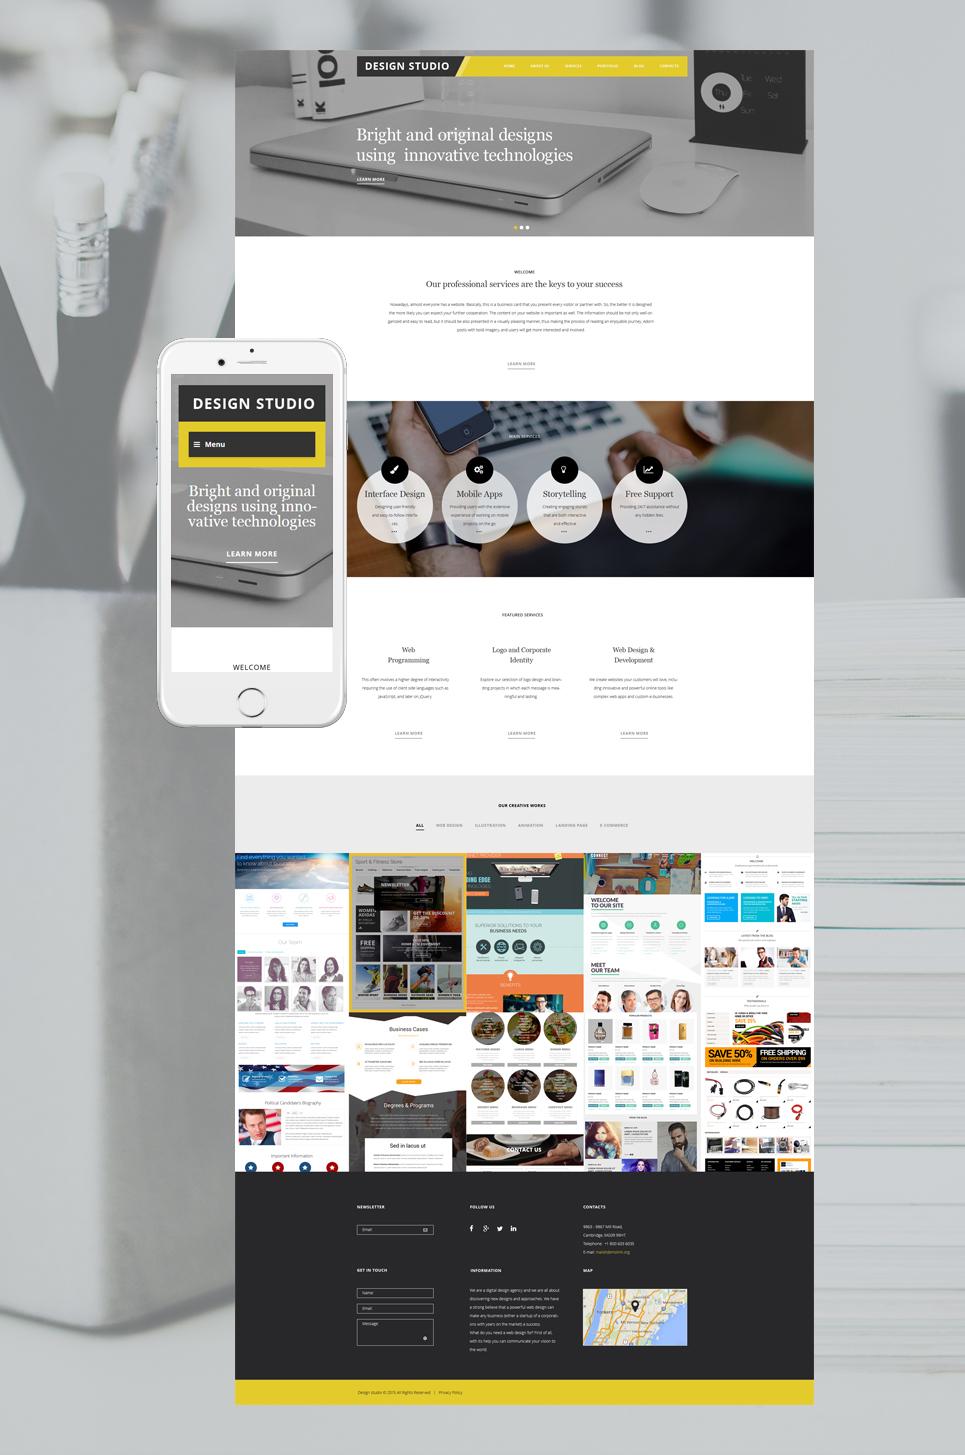 Адаптивный шаблон сайта на тему дизайн студия #56038